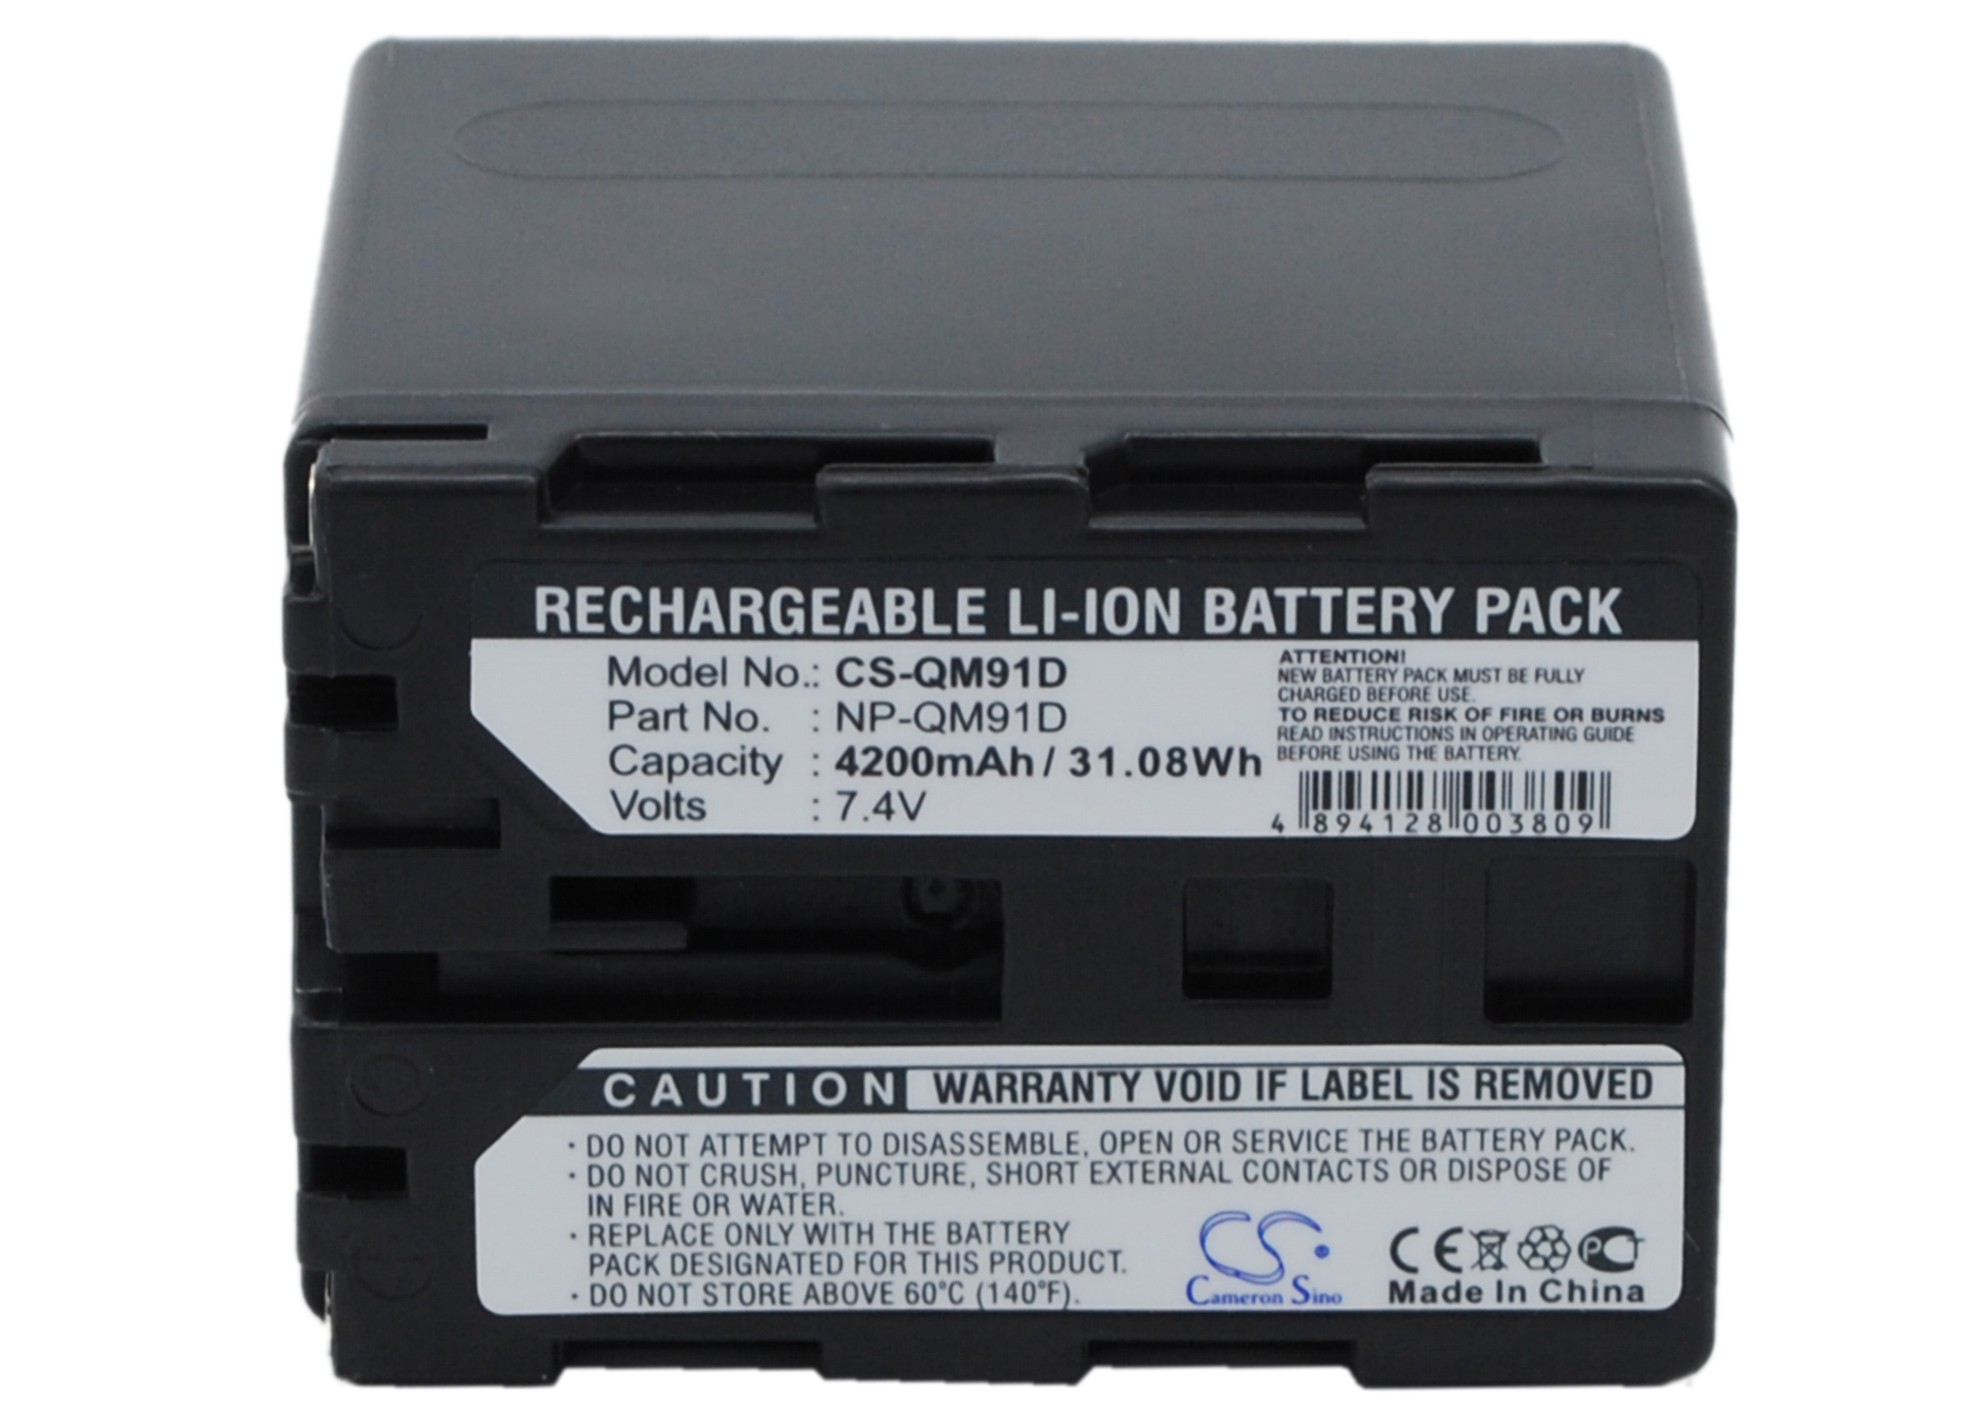 Cameron Sino baterie do kamer a fotoaparátů pro SONY DCR-DVD91 7.4V Li-ion 4200mAh tmavě šedá - neoriginální